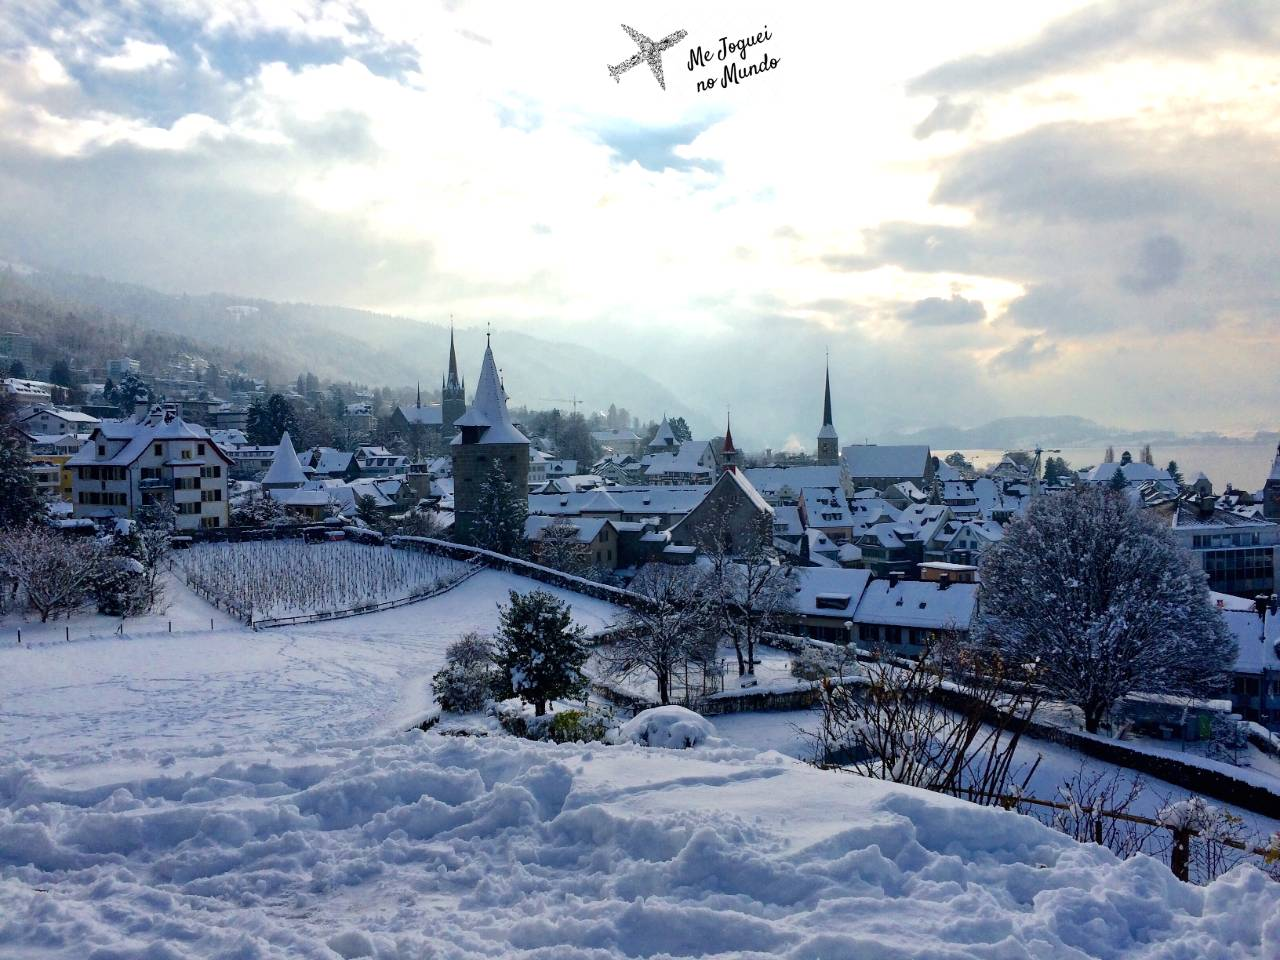 suiça no inverno